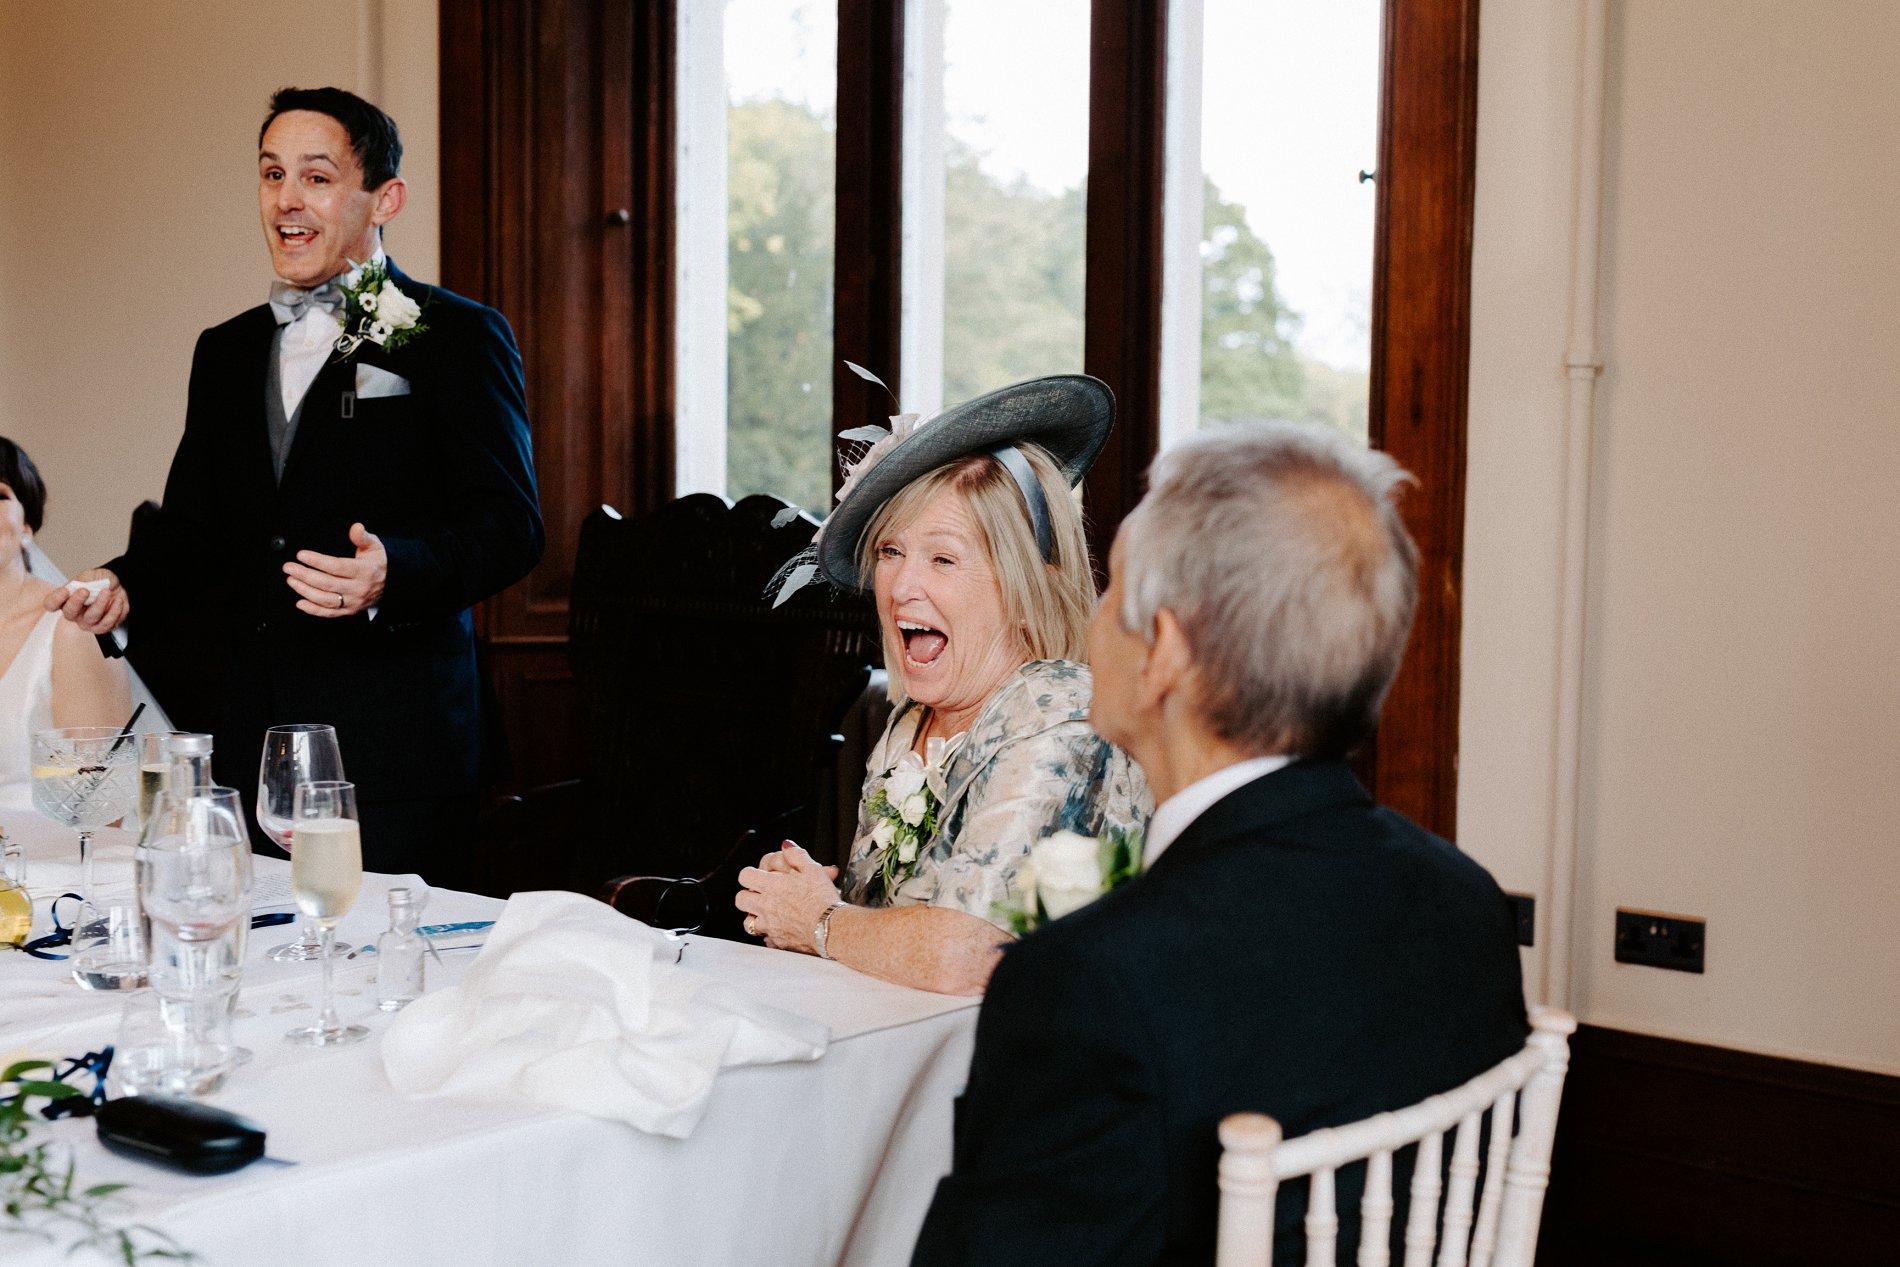 An Elegant White Wedding at Thicket Priory (c) Carla Whittingham Photography (72)